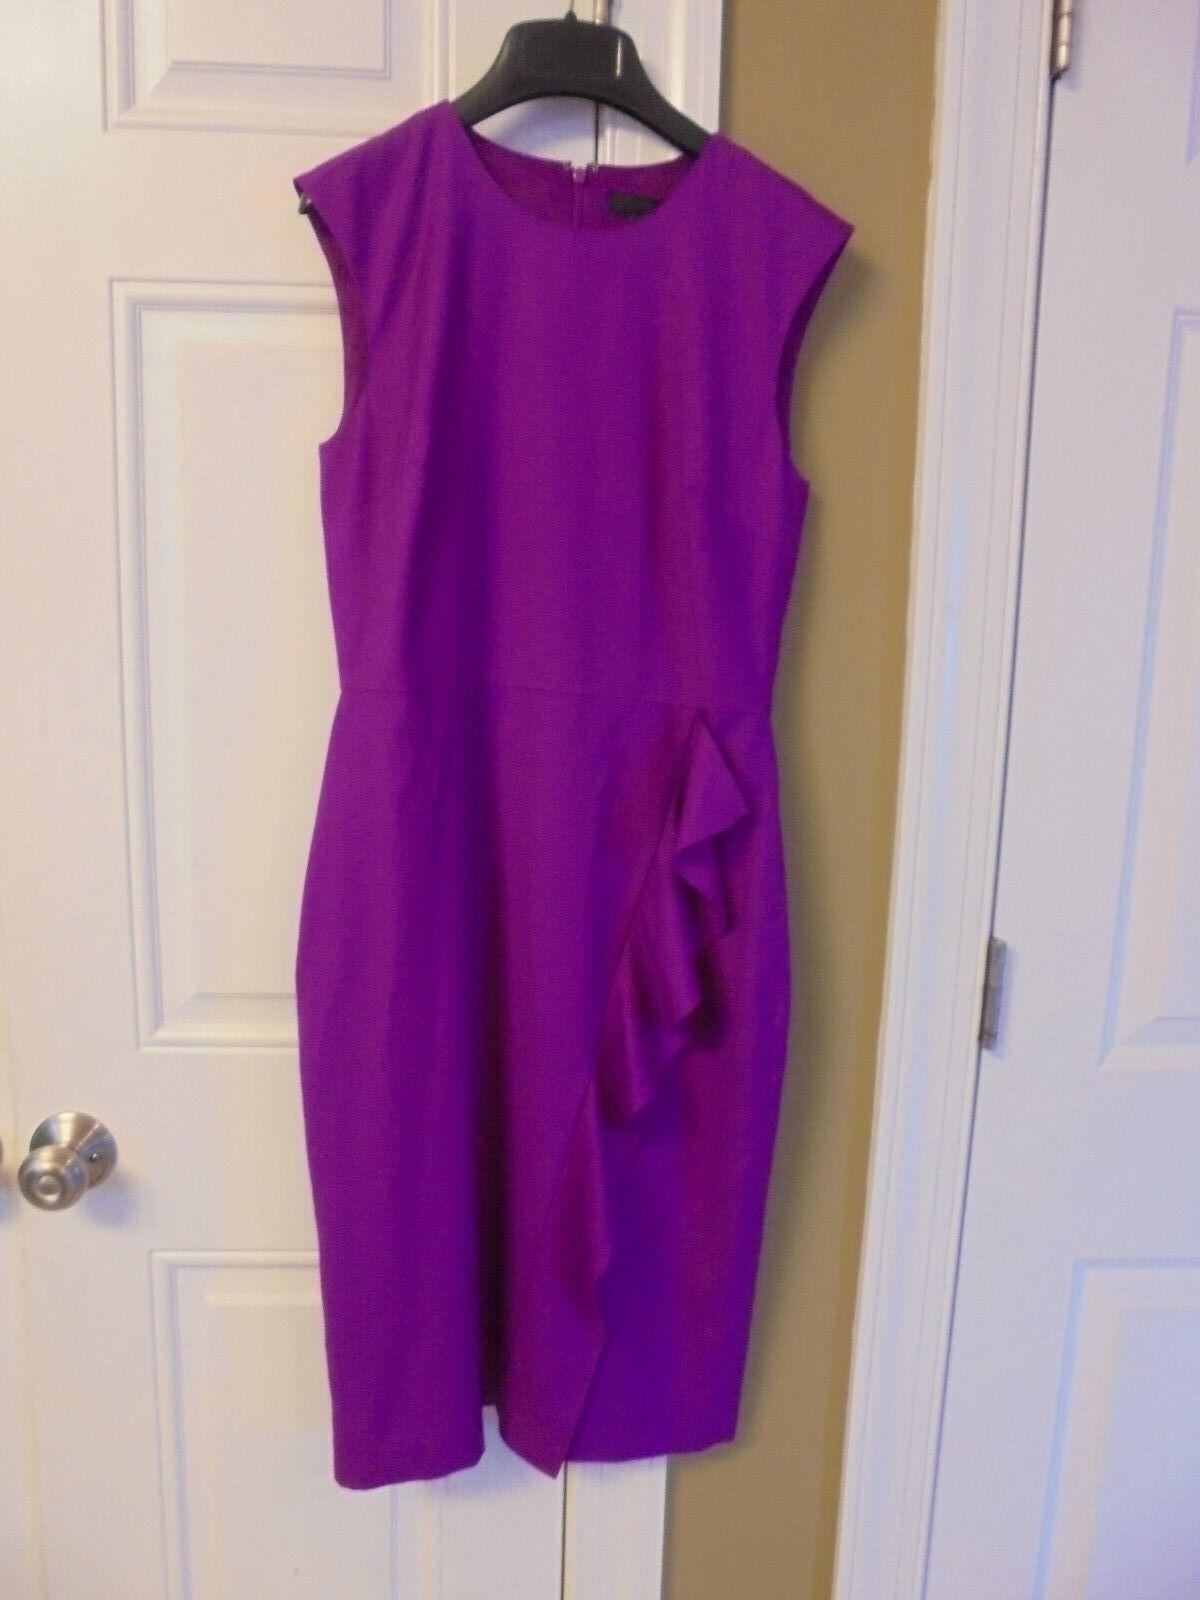 J CREW RUFFLE SHEATH DRESS 120 S WOOL BRIGHT  PLUM Größe-2  G8320